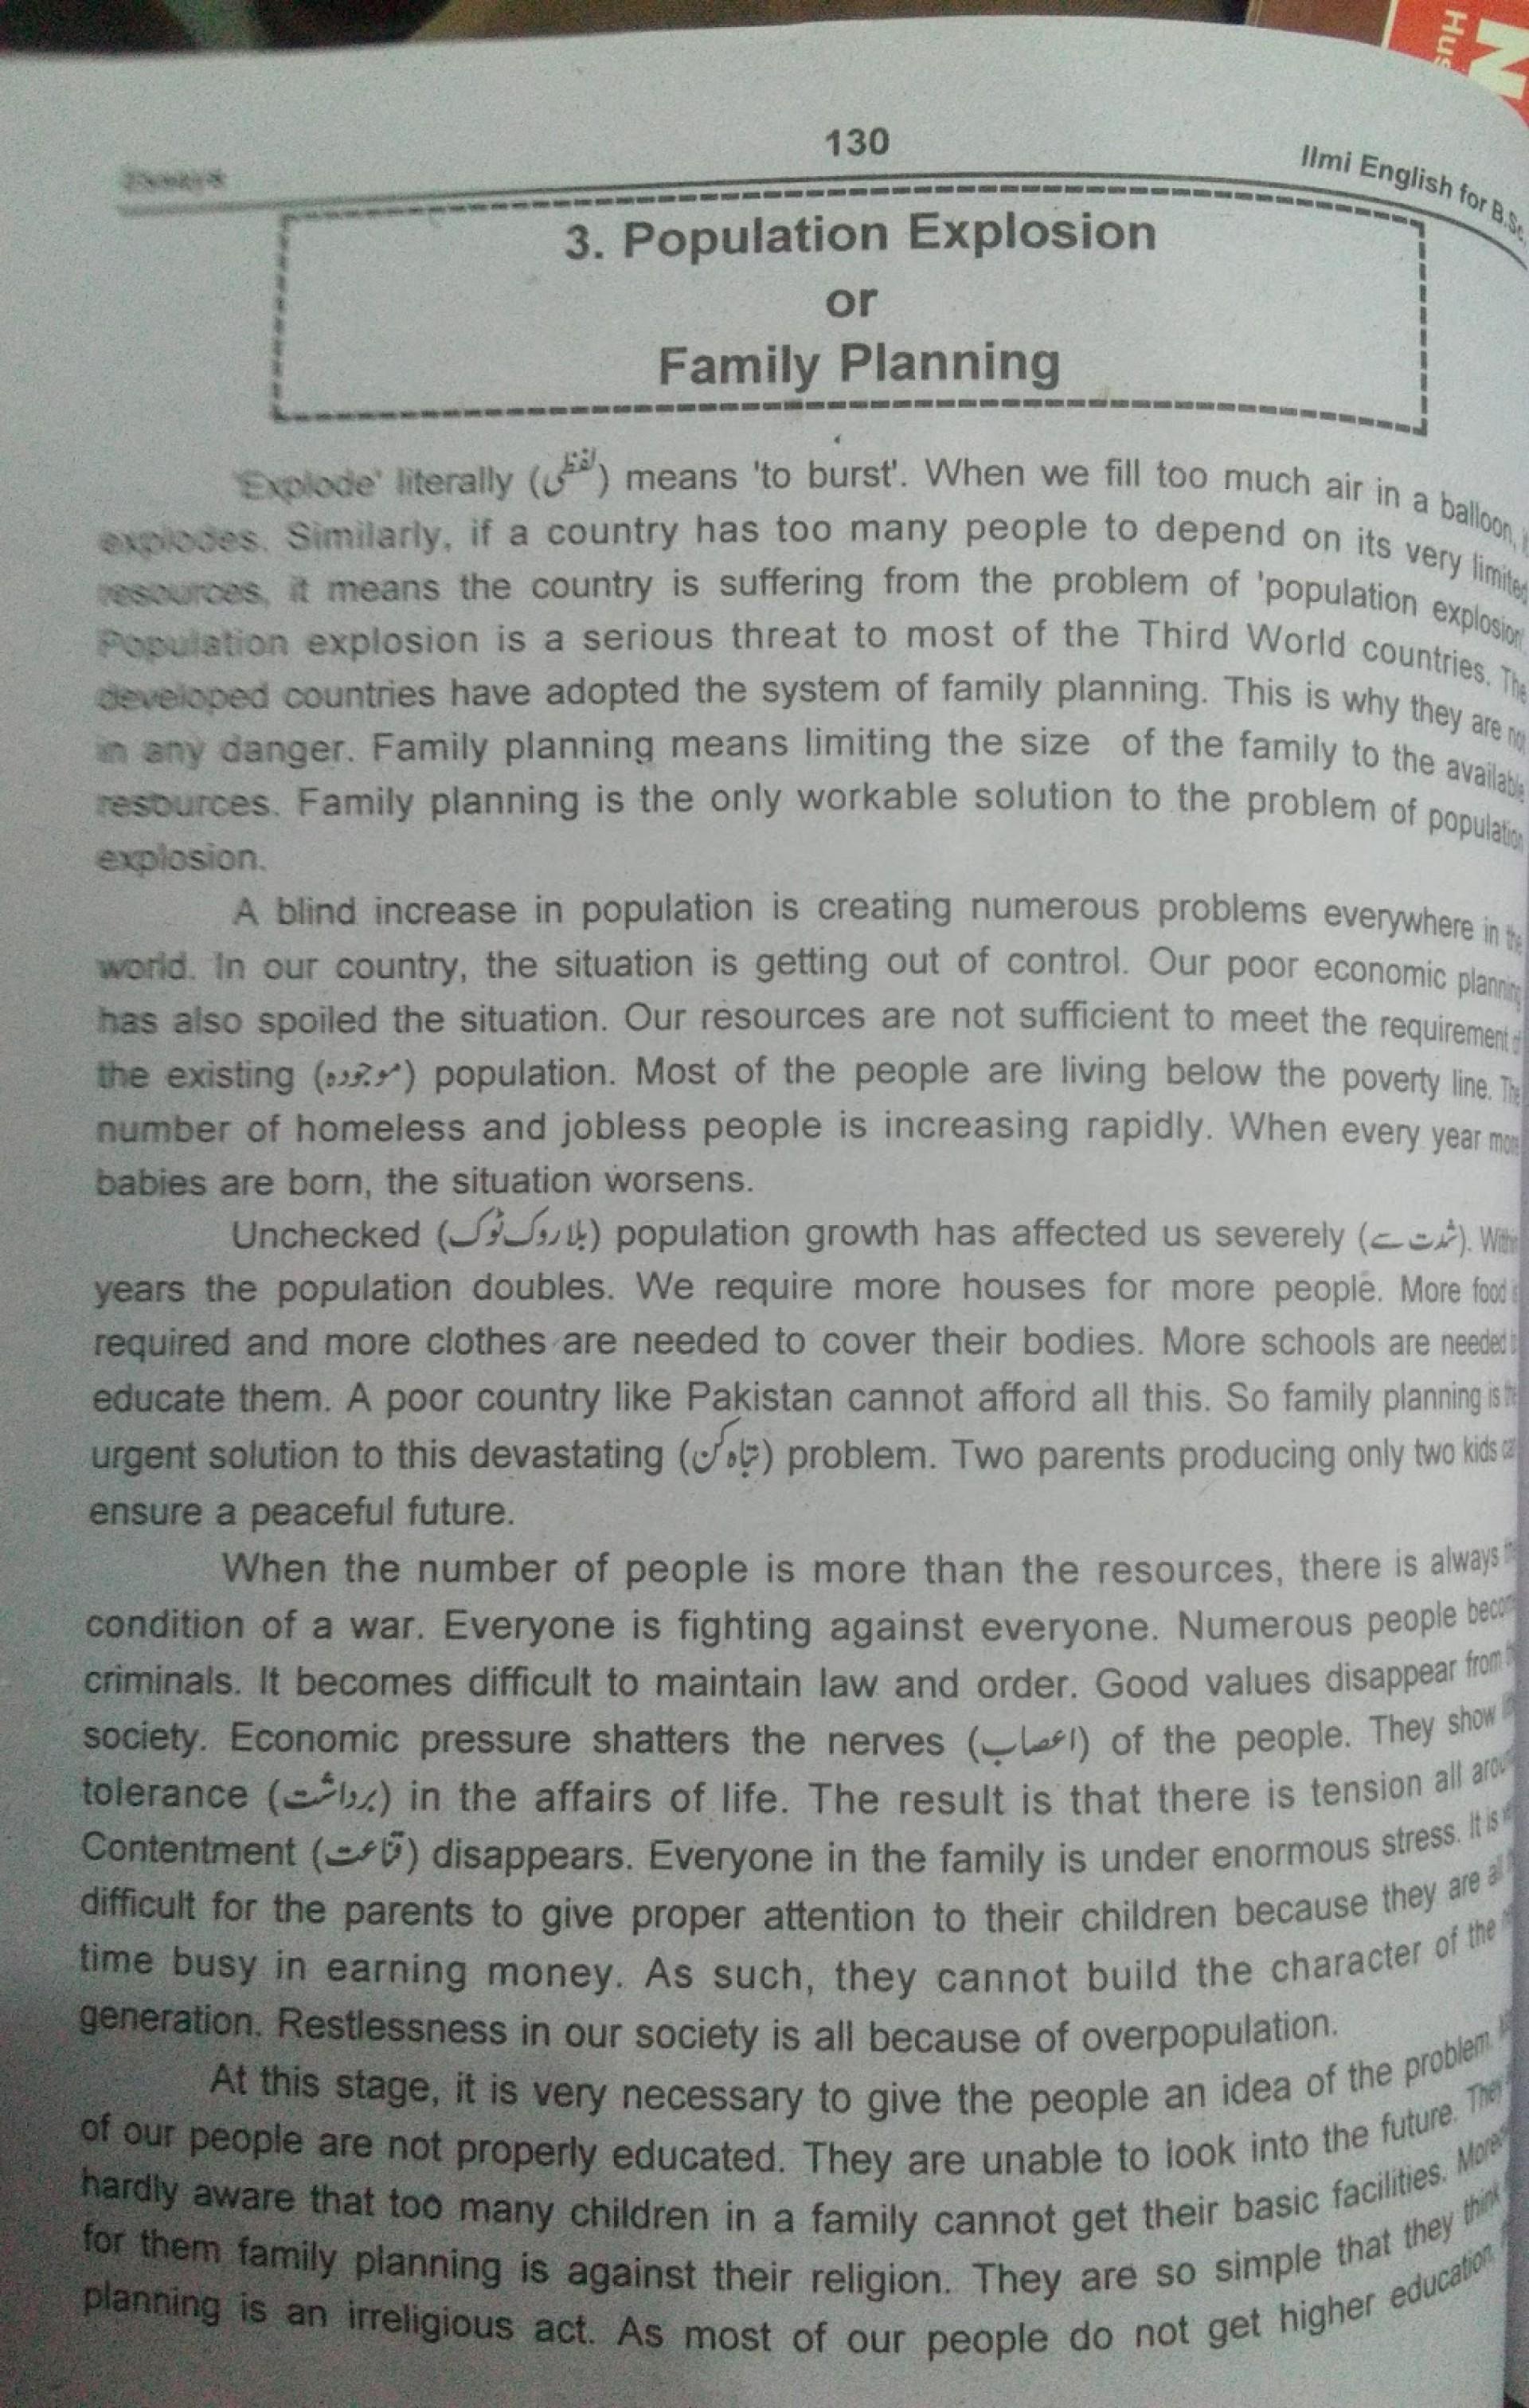 007 Essay On Population Family2bplaning Impressive Control Explosion In Kannada Pakistan 1920